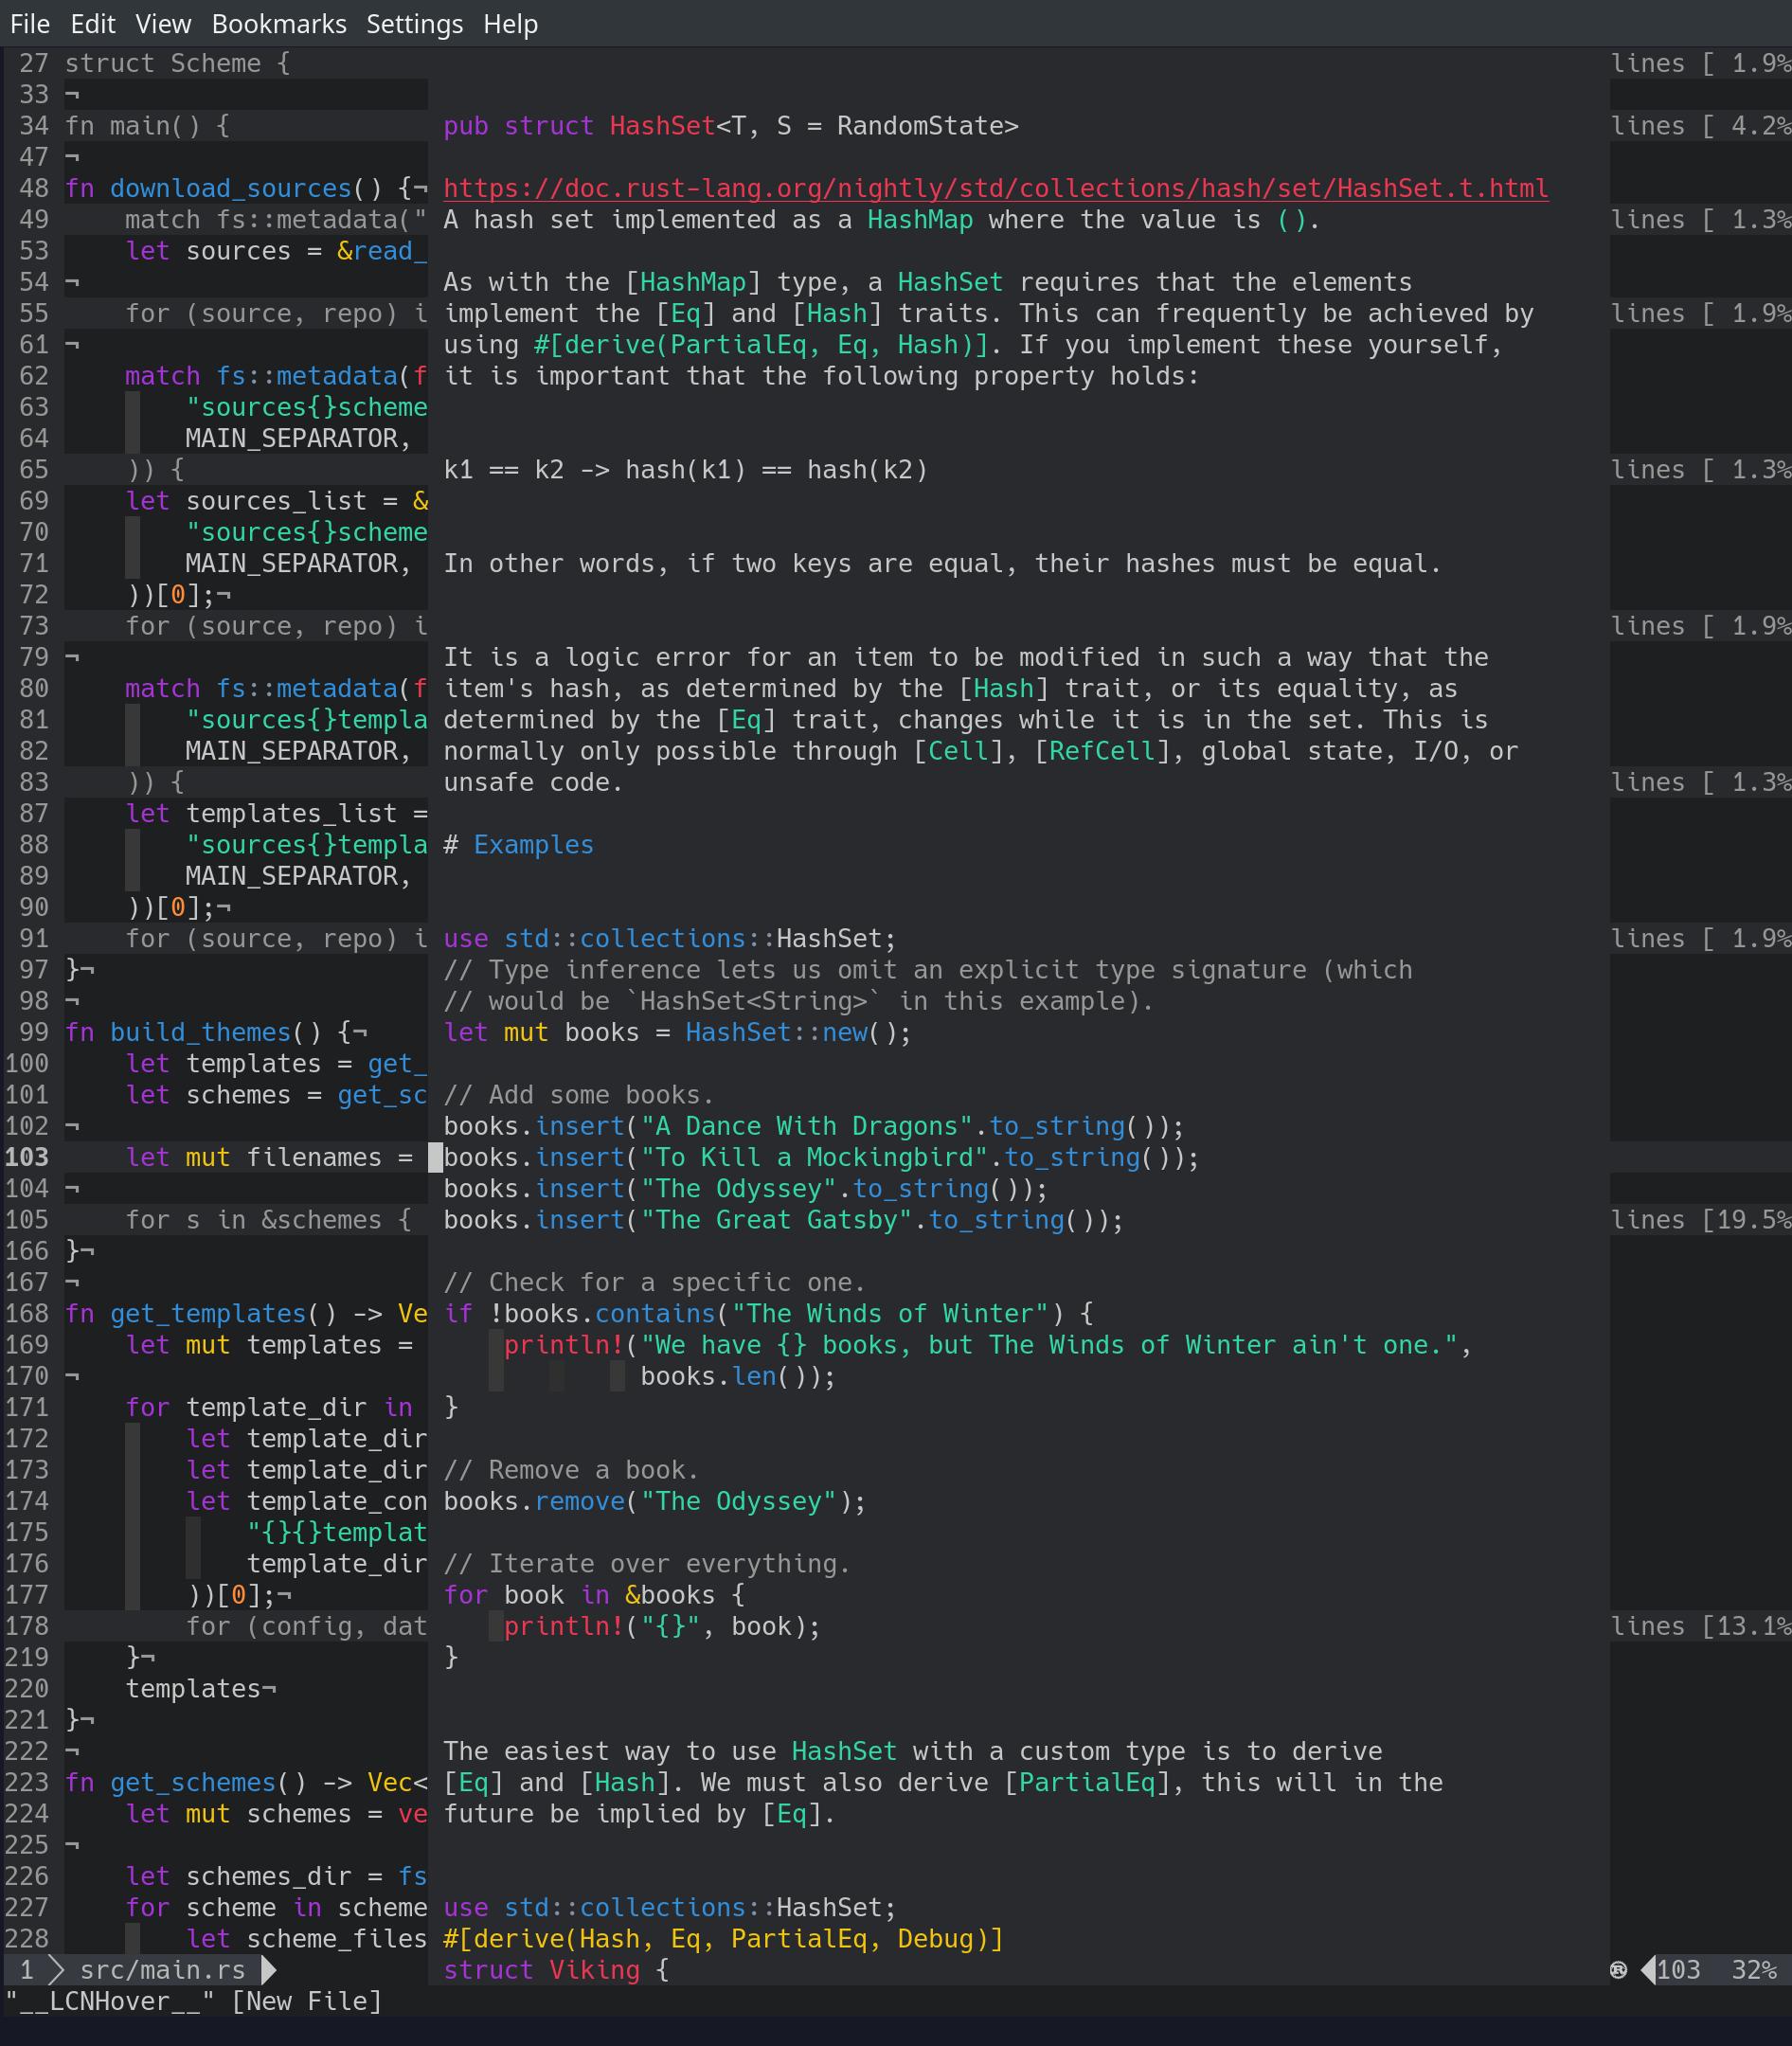 https://cloud-g02xa11g5-hack-club-bot.vercel.app/0image.png